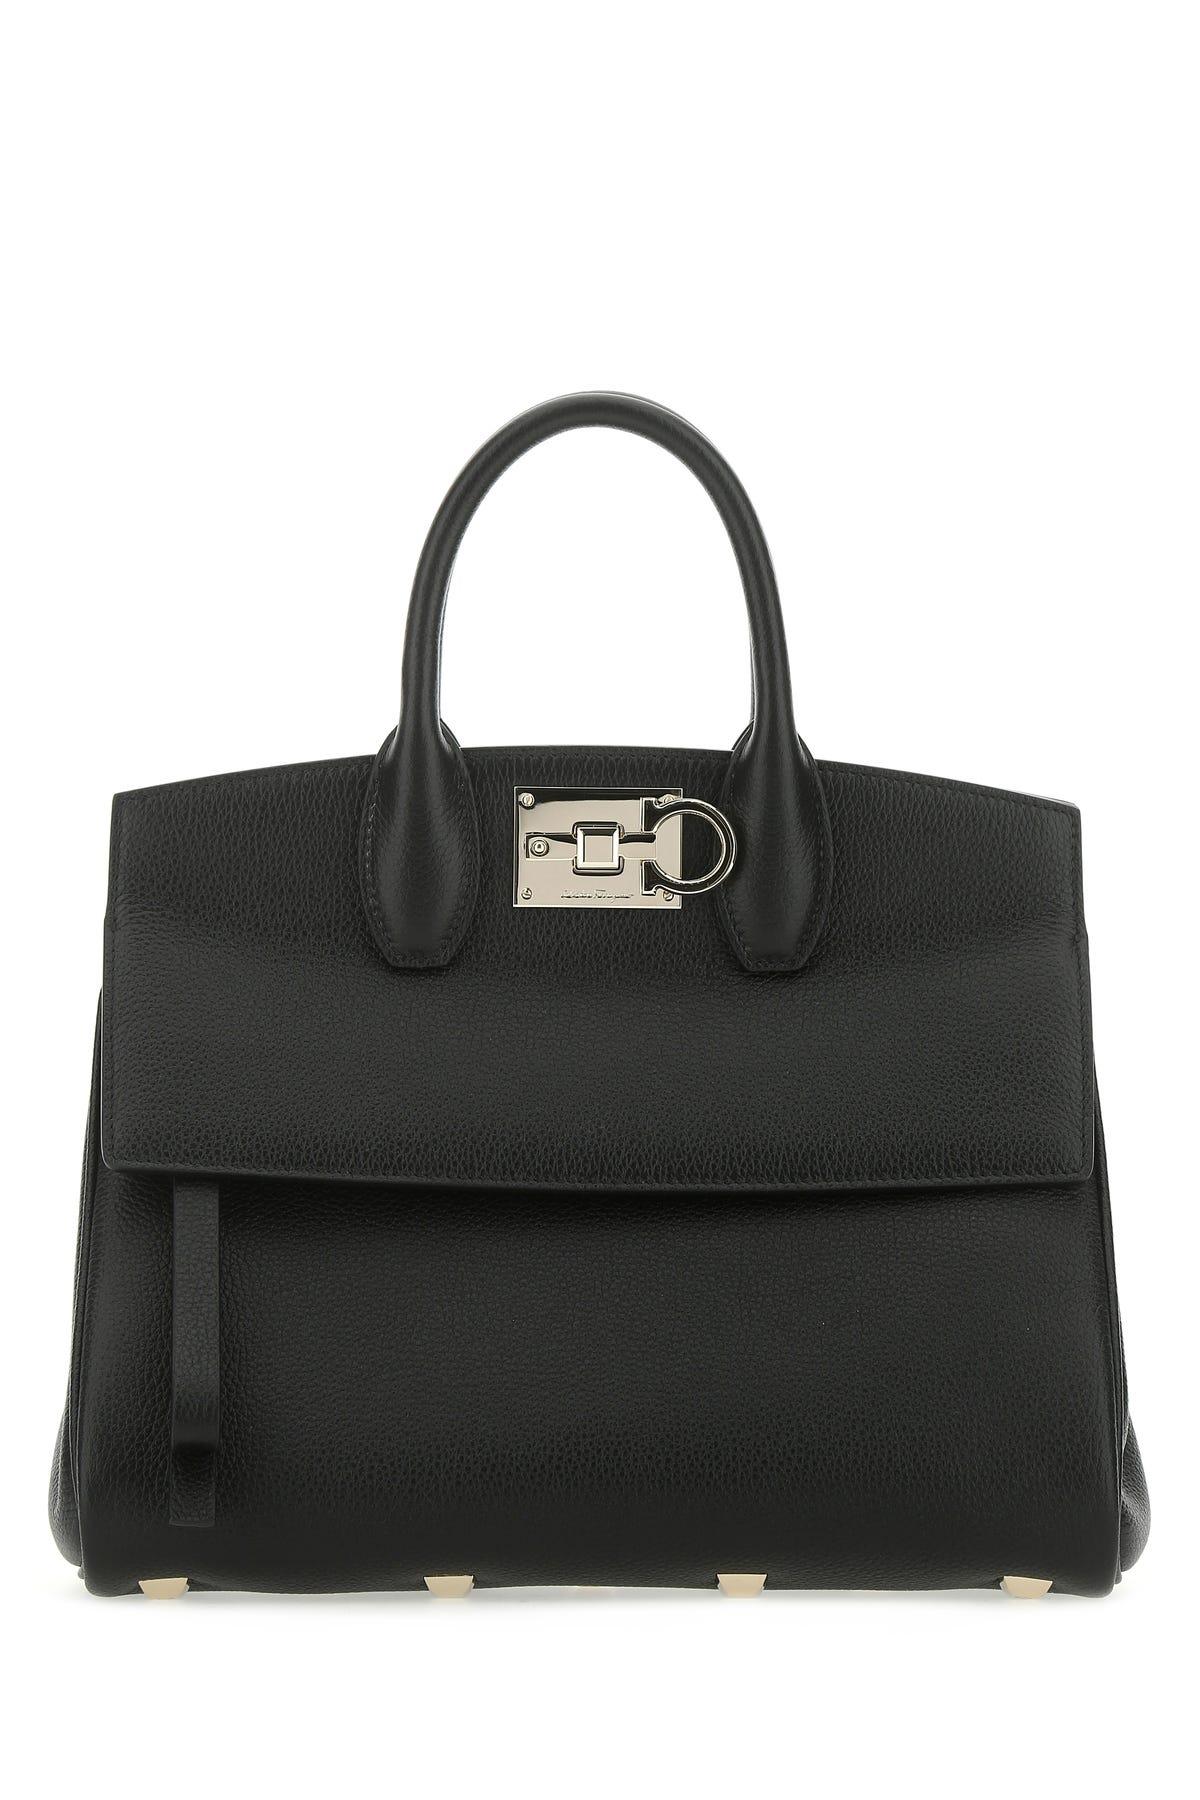 Salvatore Ferragamo Black Leather The Studio Handbag Nd  Donna Tu